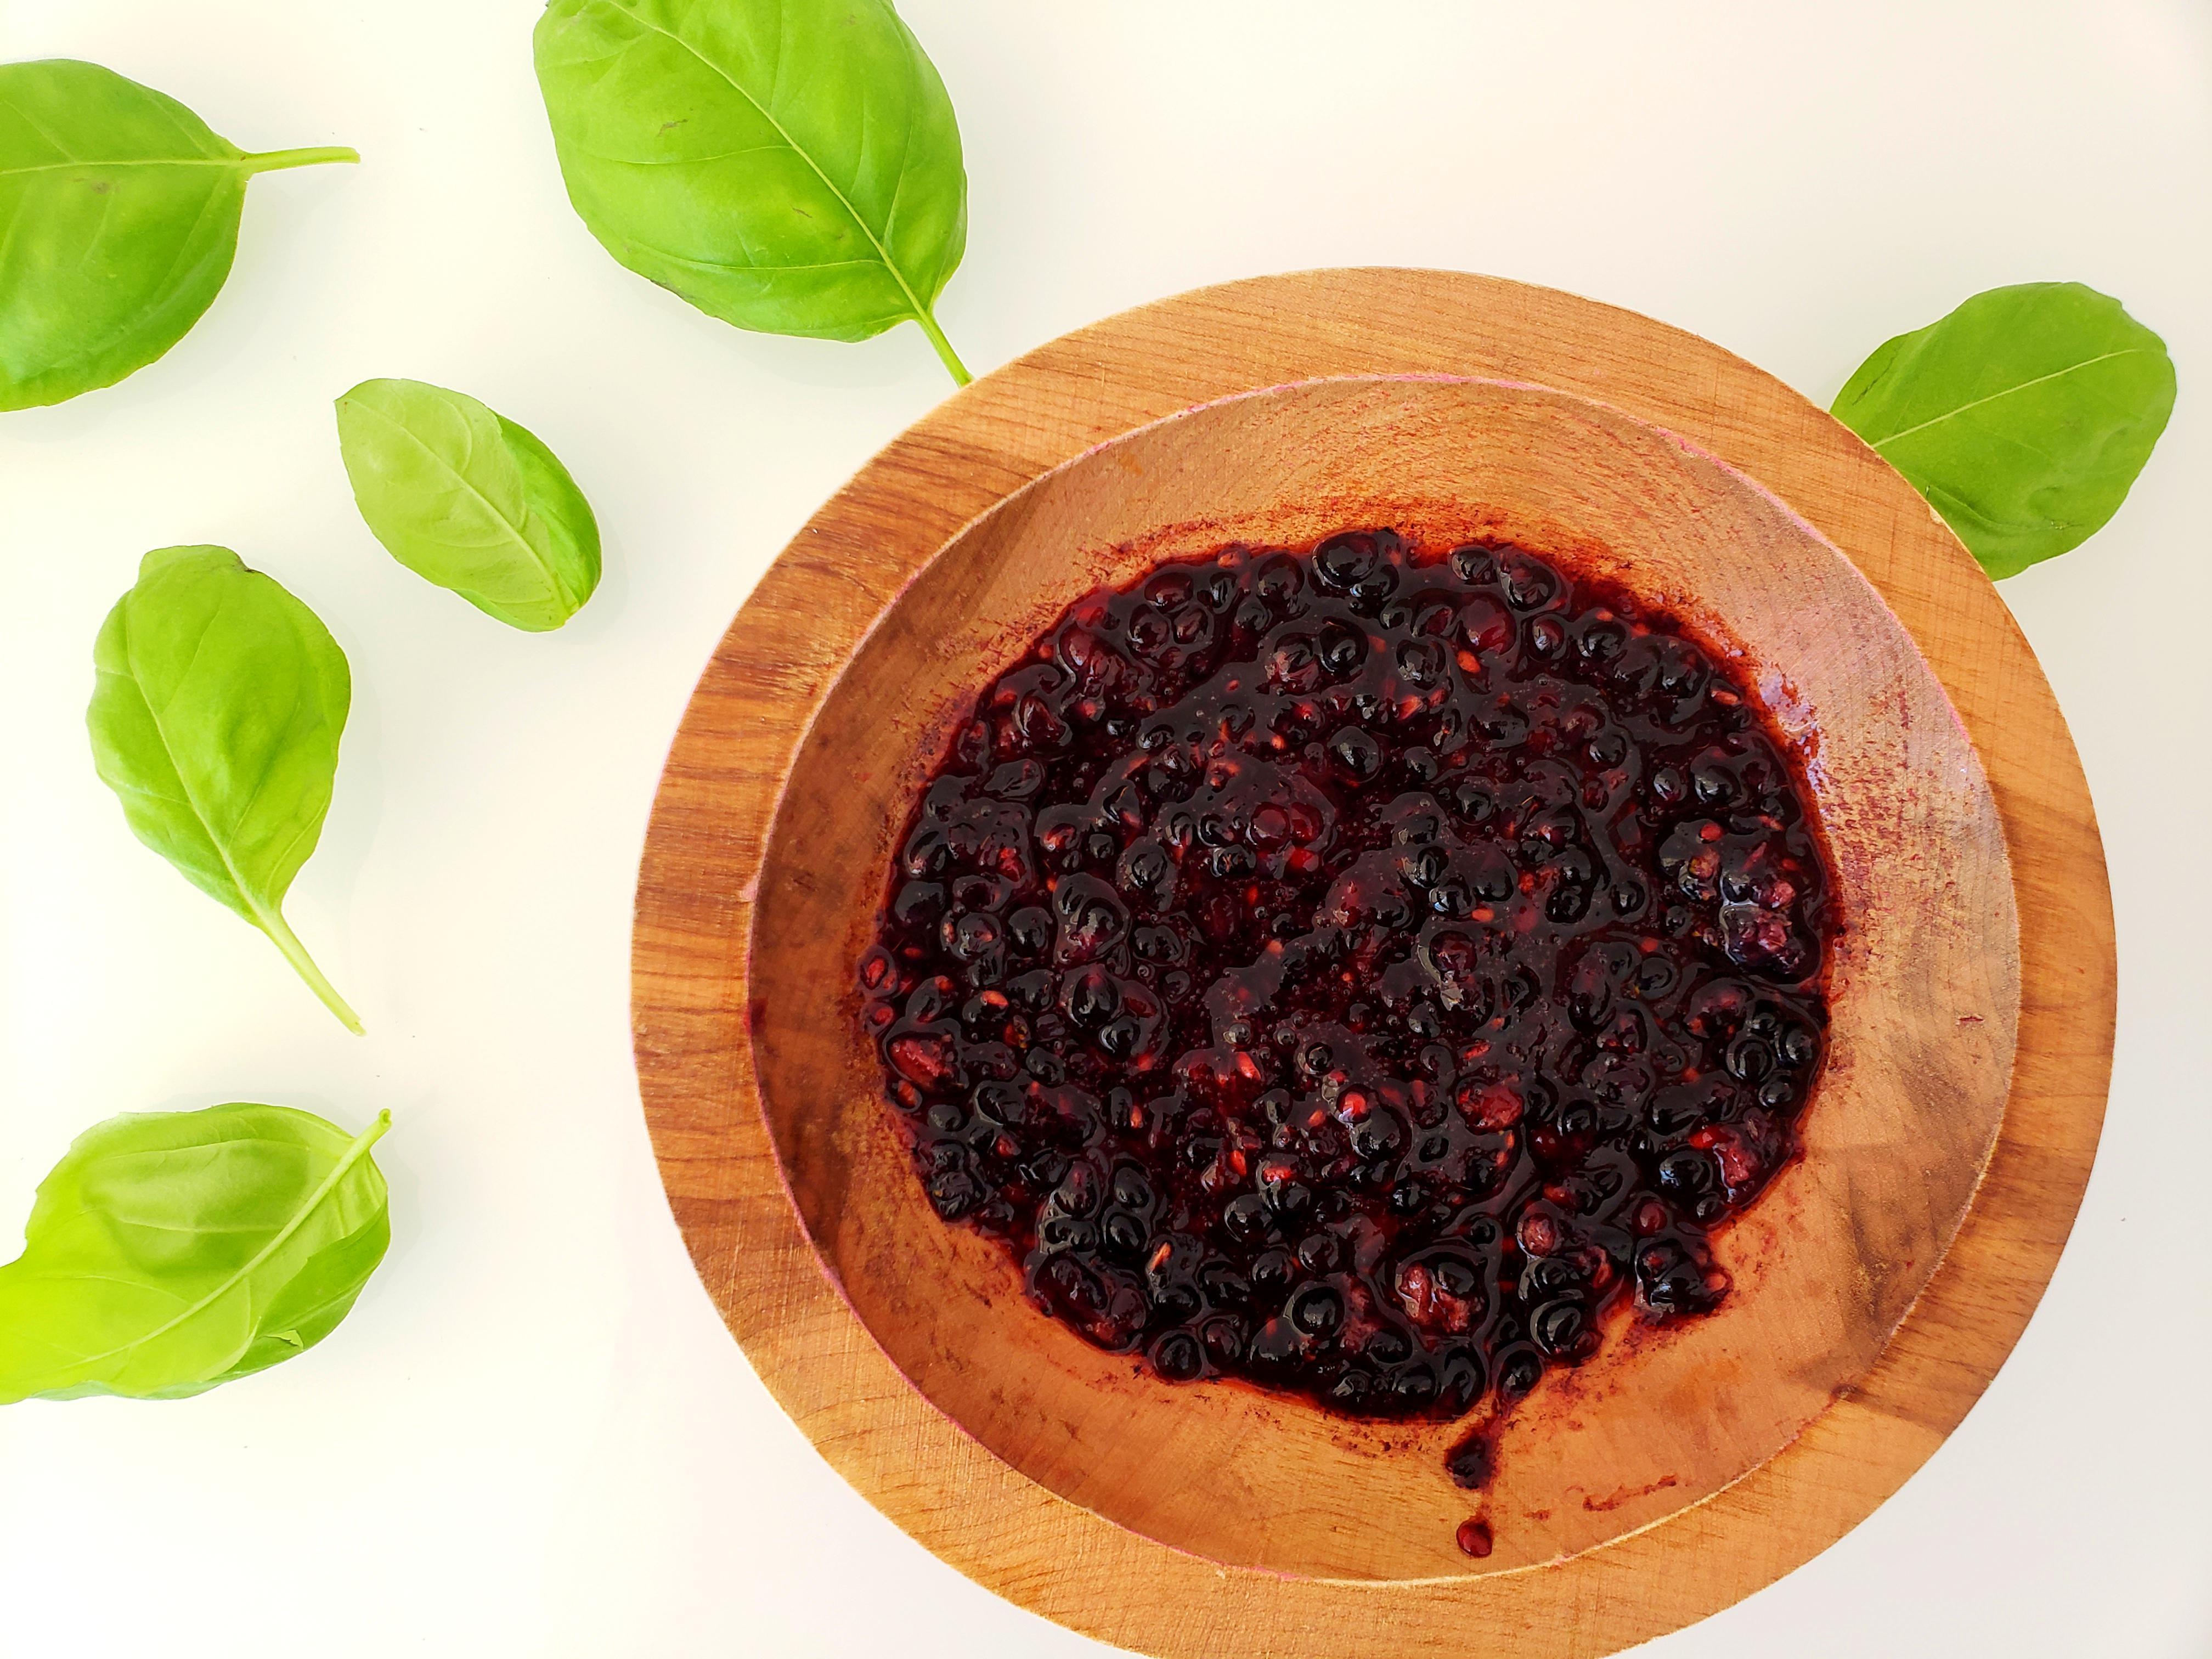 Smashed Blackberries in Bowl